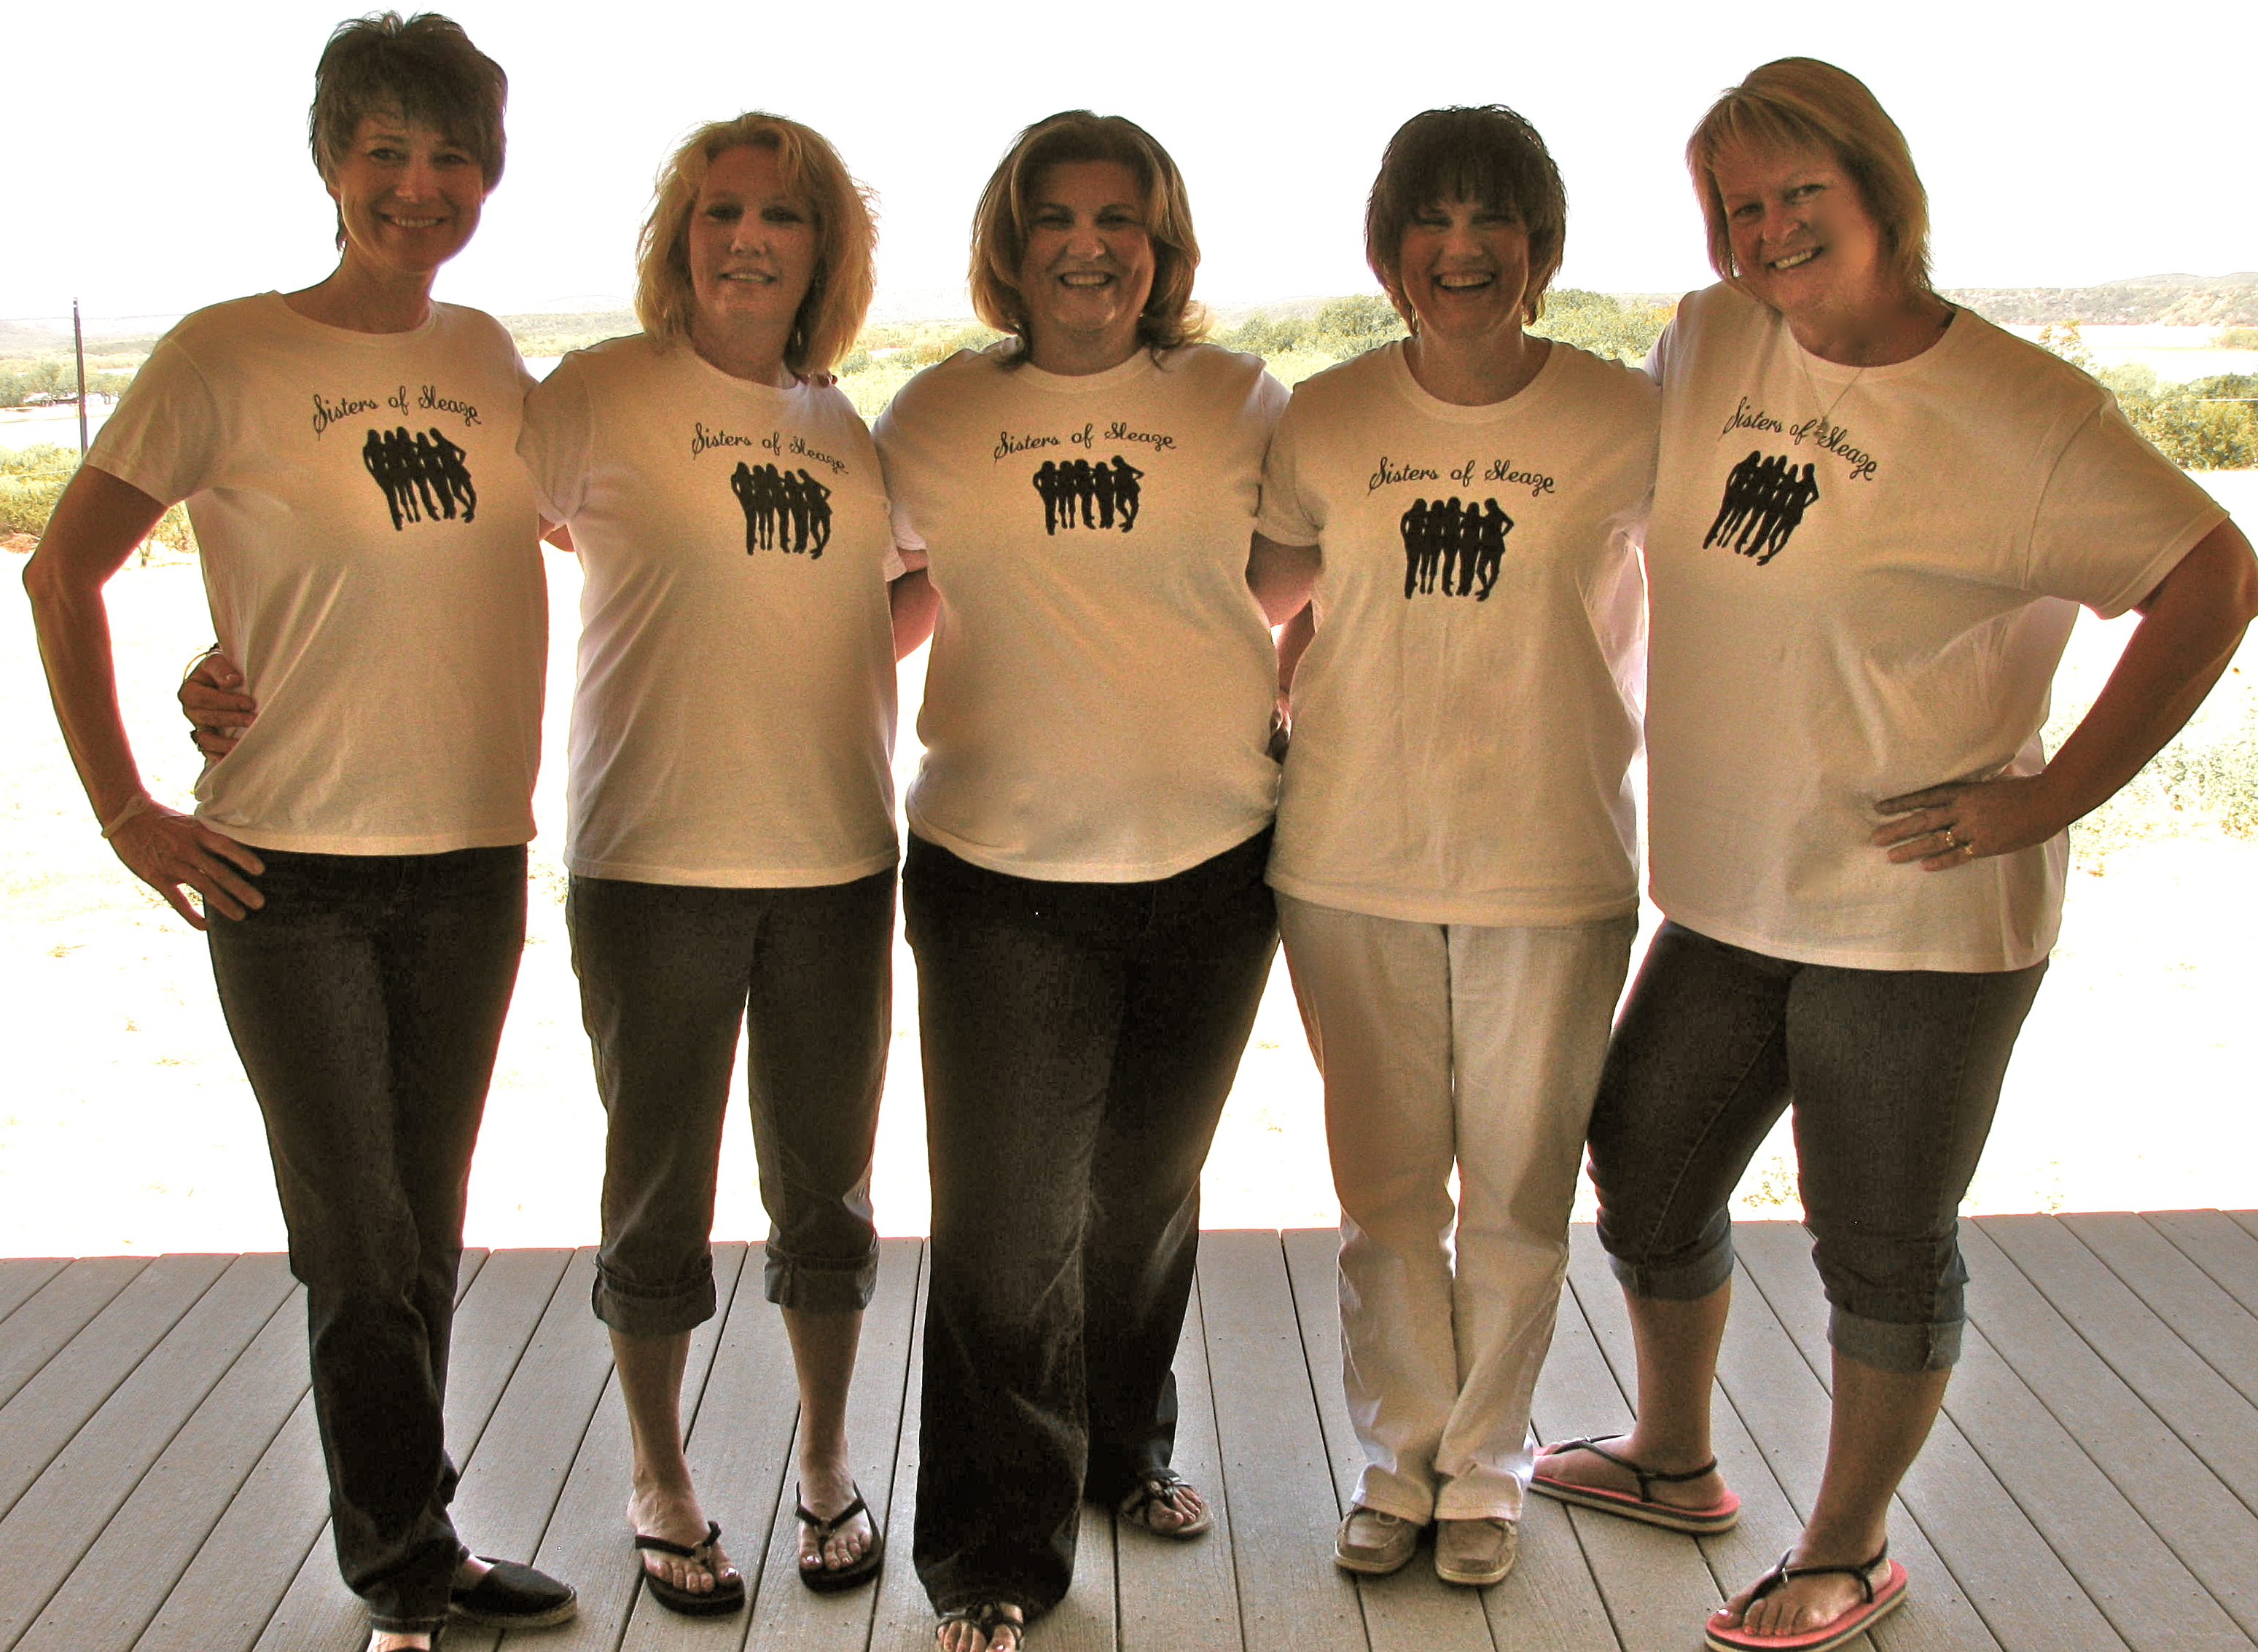 Custom T Shirts For Sisters Of Sleaze Shirt Design Ideas